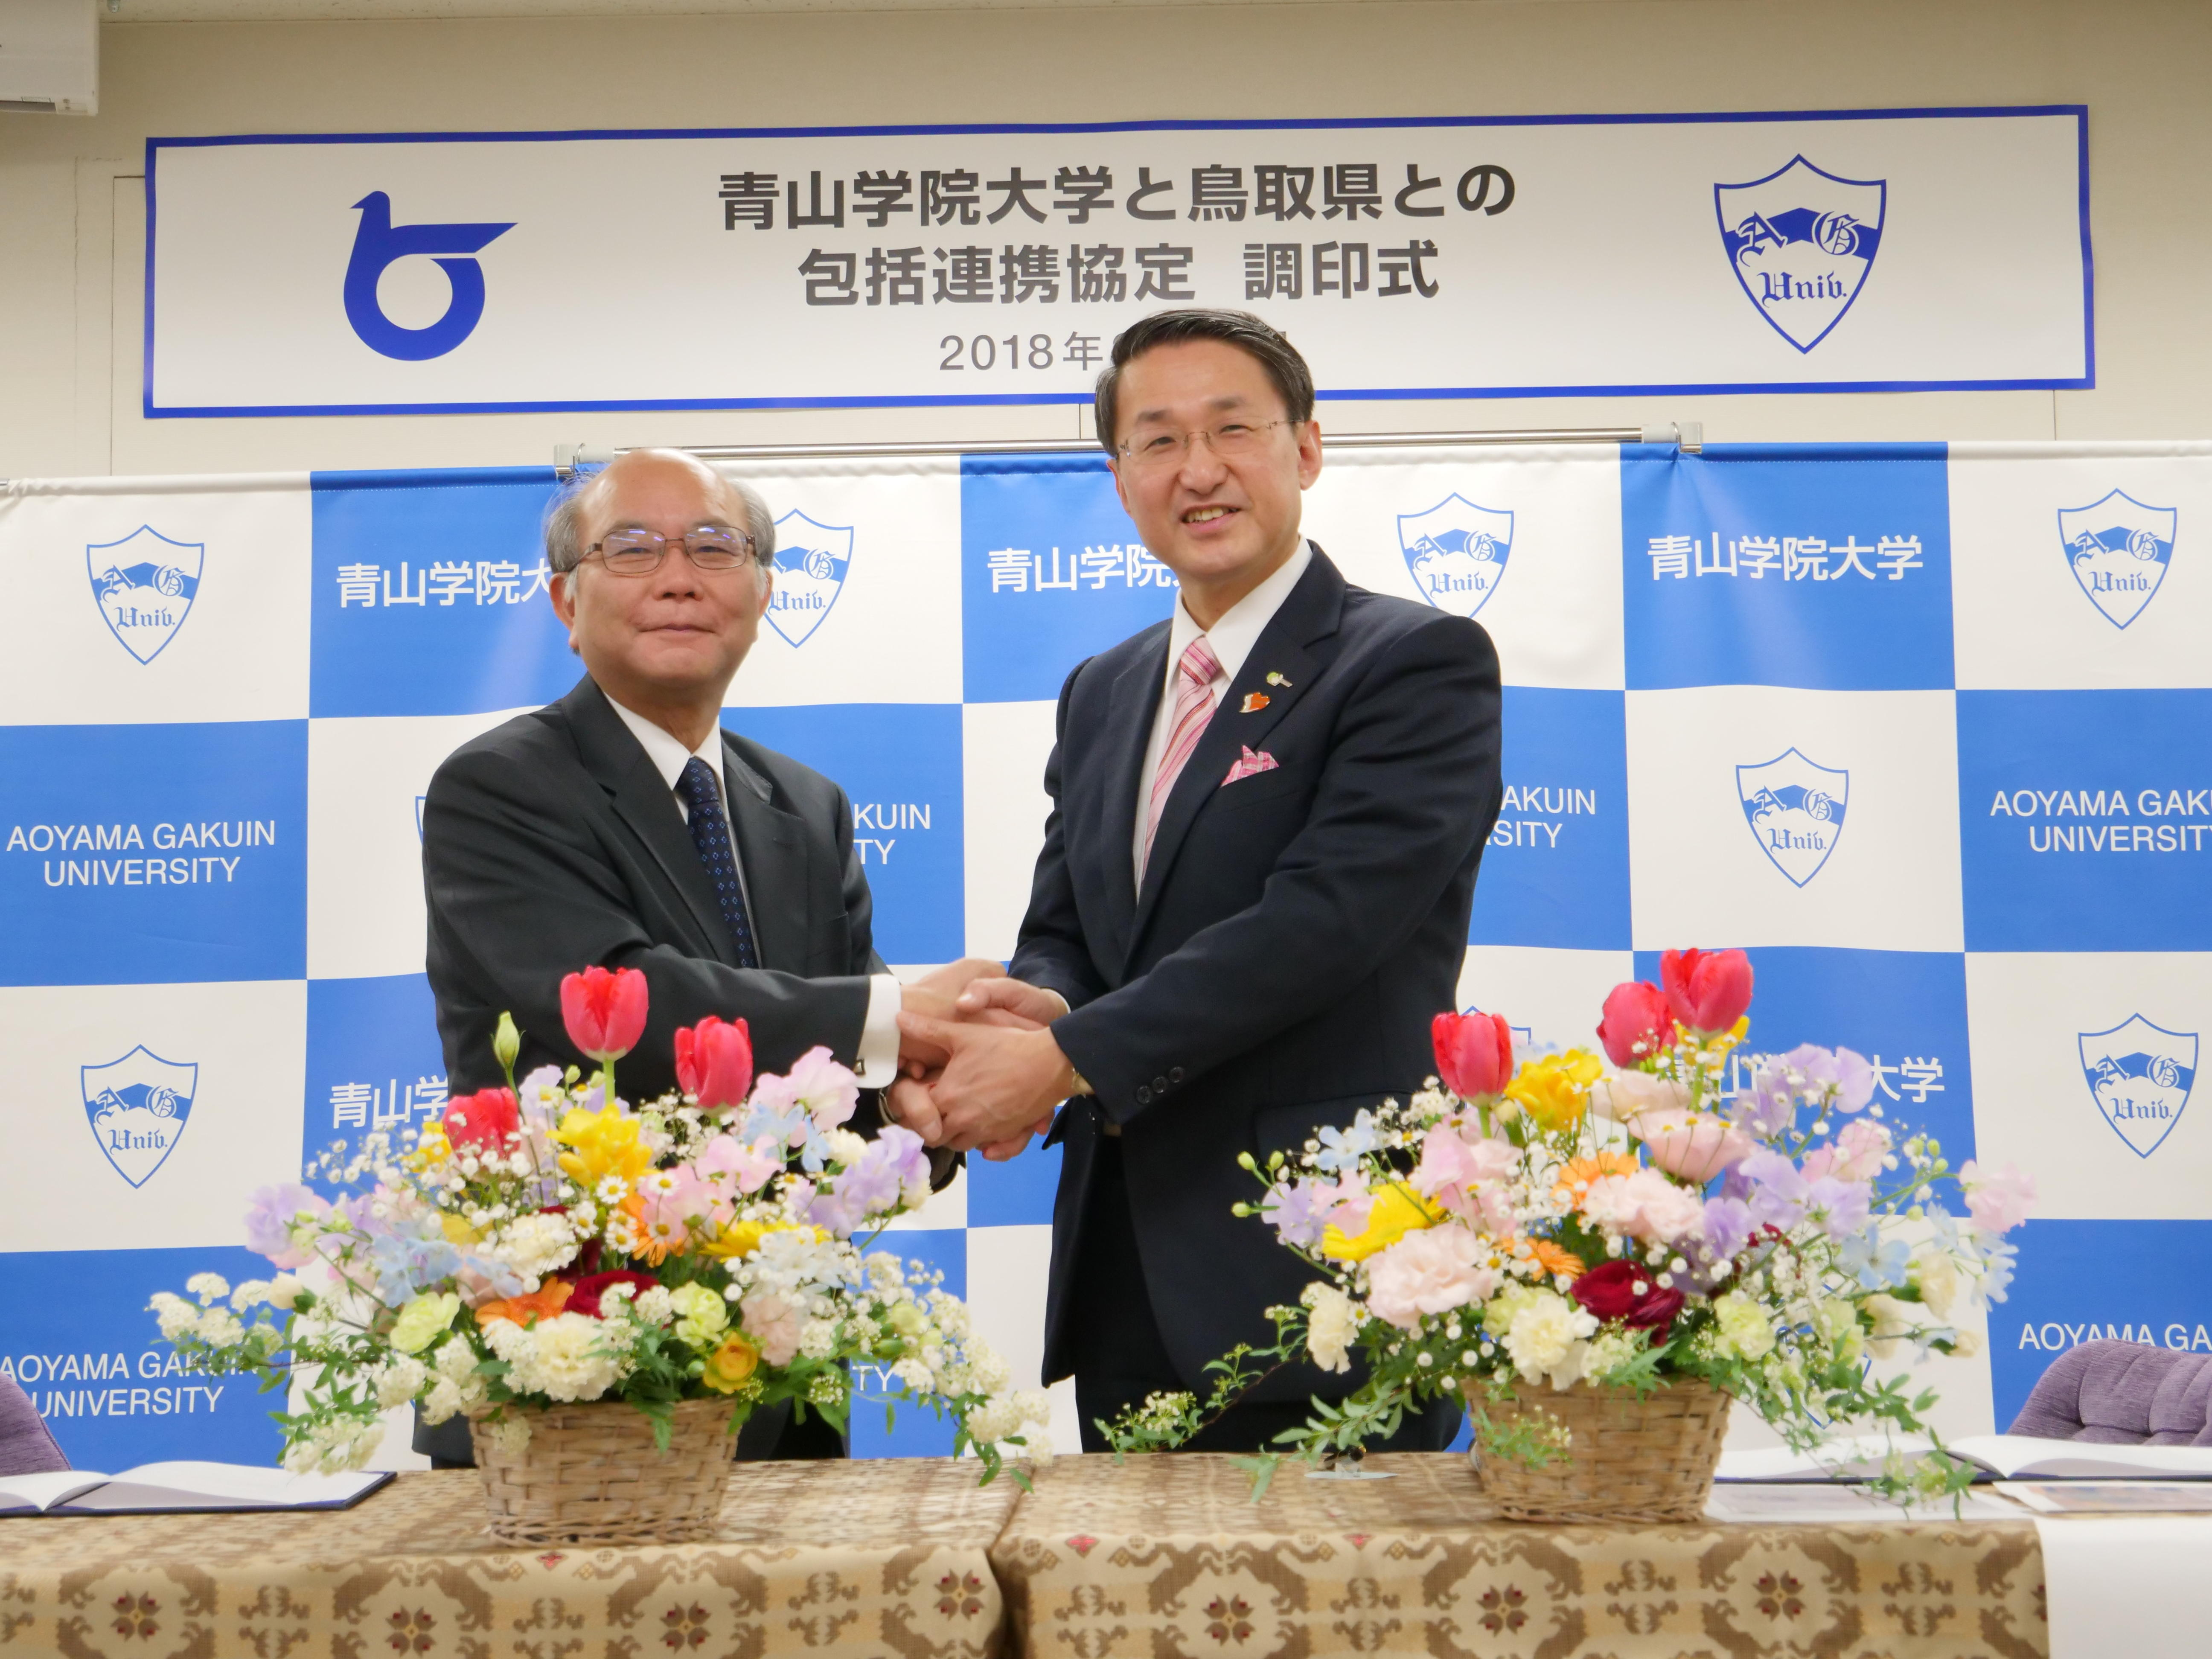 青山学院大学と鳥取県が包括連携協定を締結